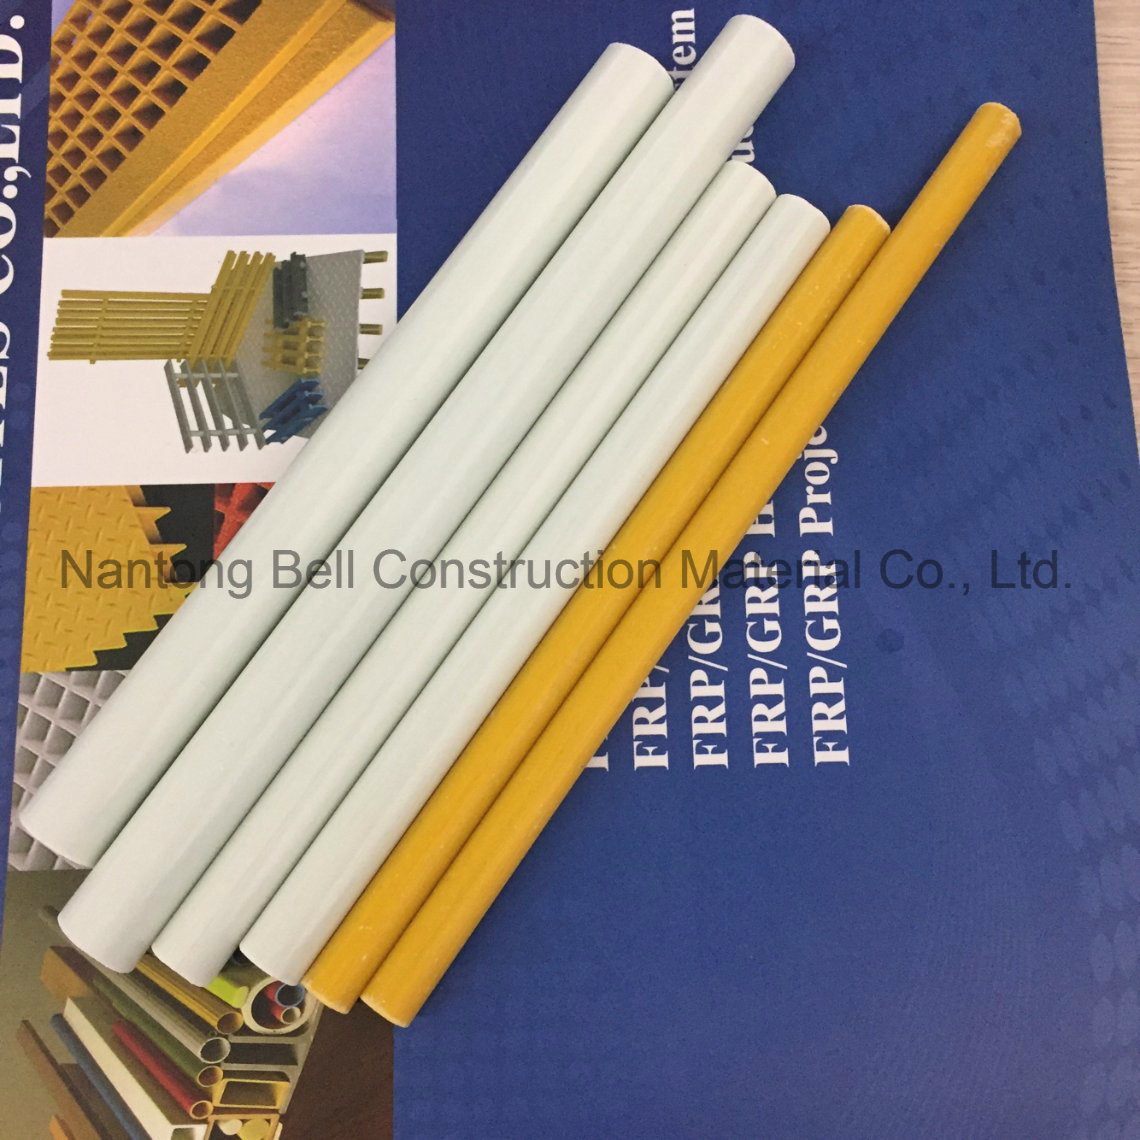 Good Quality FRP/Fiberglass Round Solid Rods